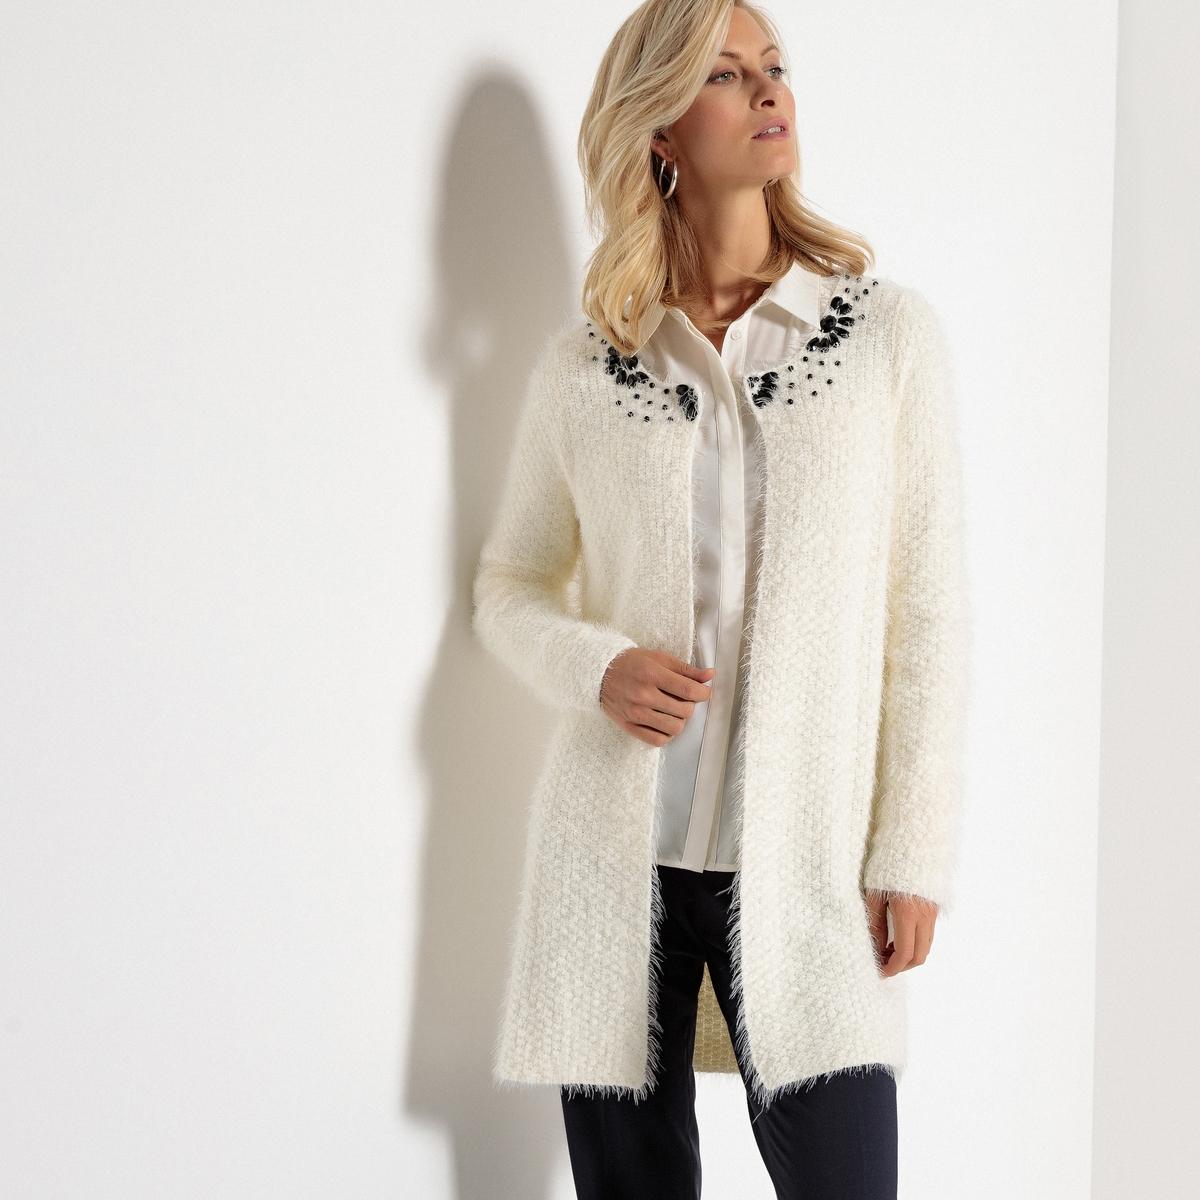 8ae34484078 Embellished Coatigan - Female First Shopping